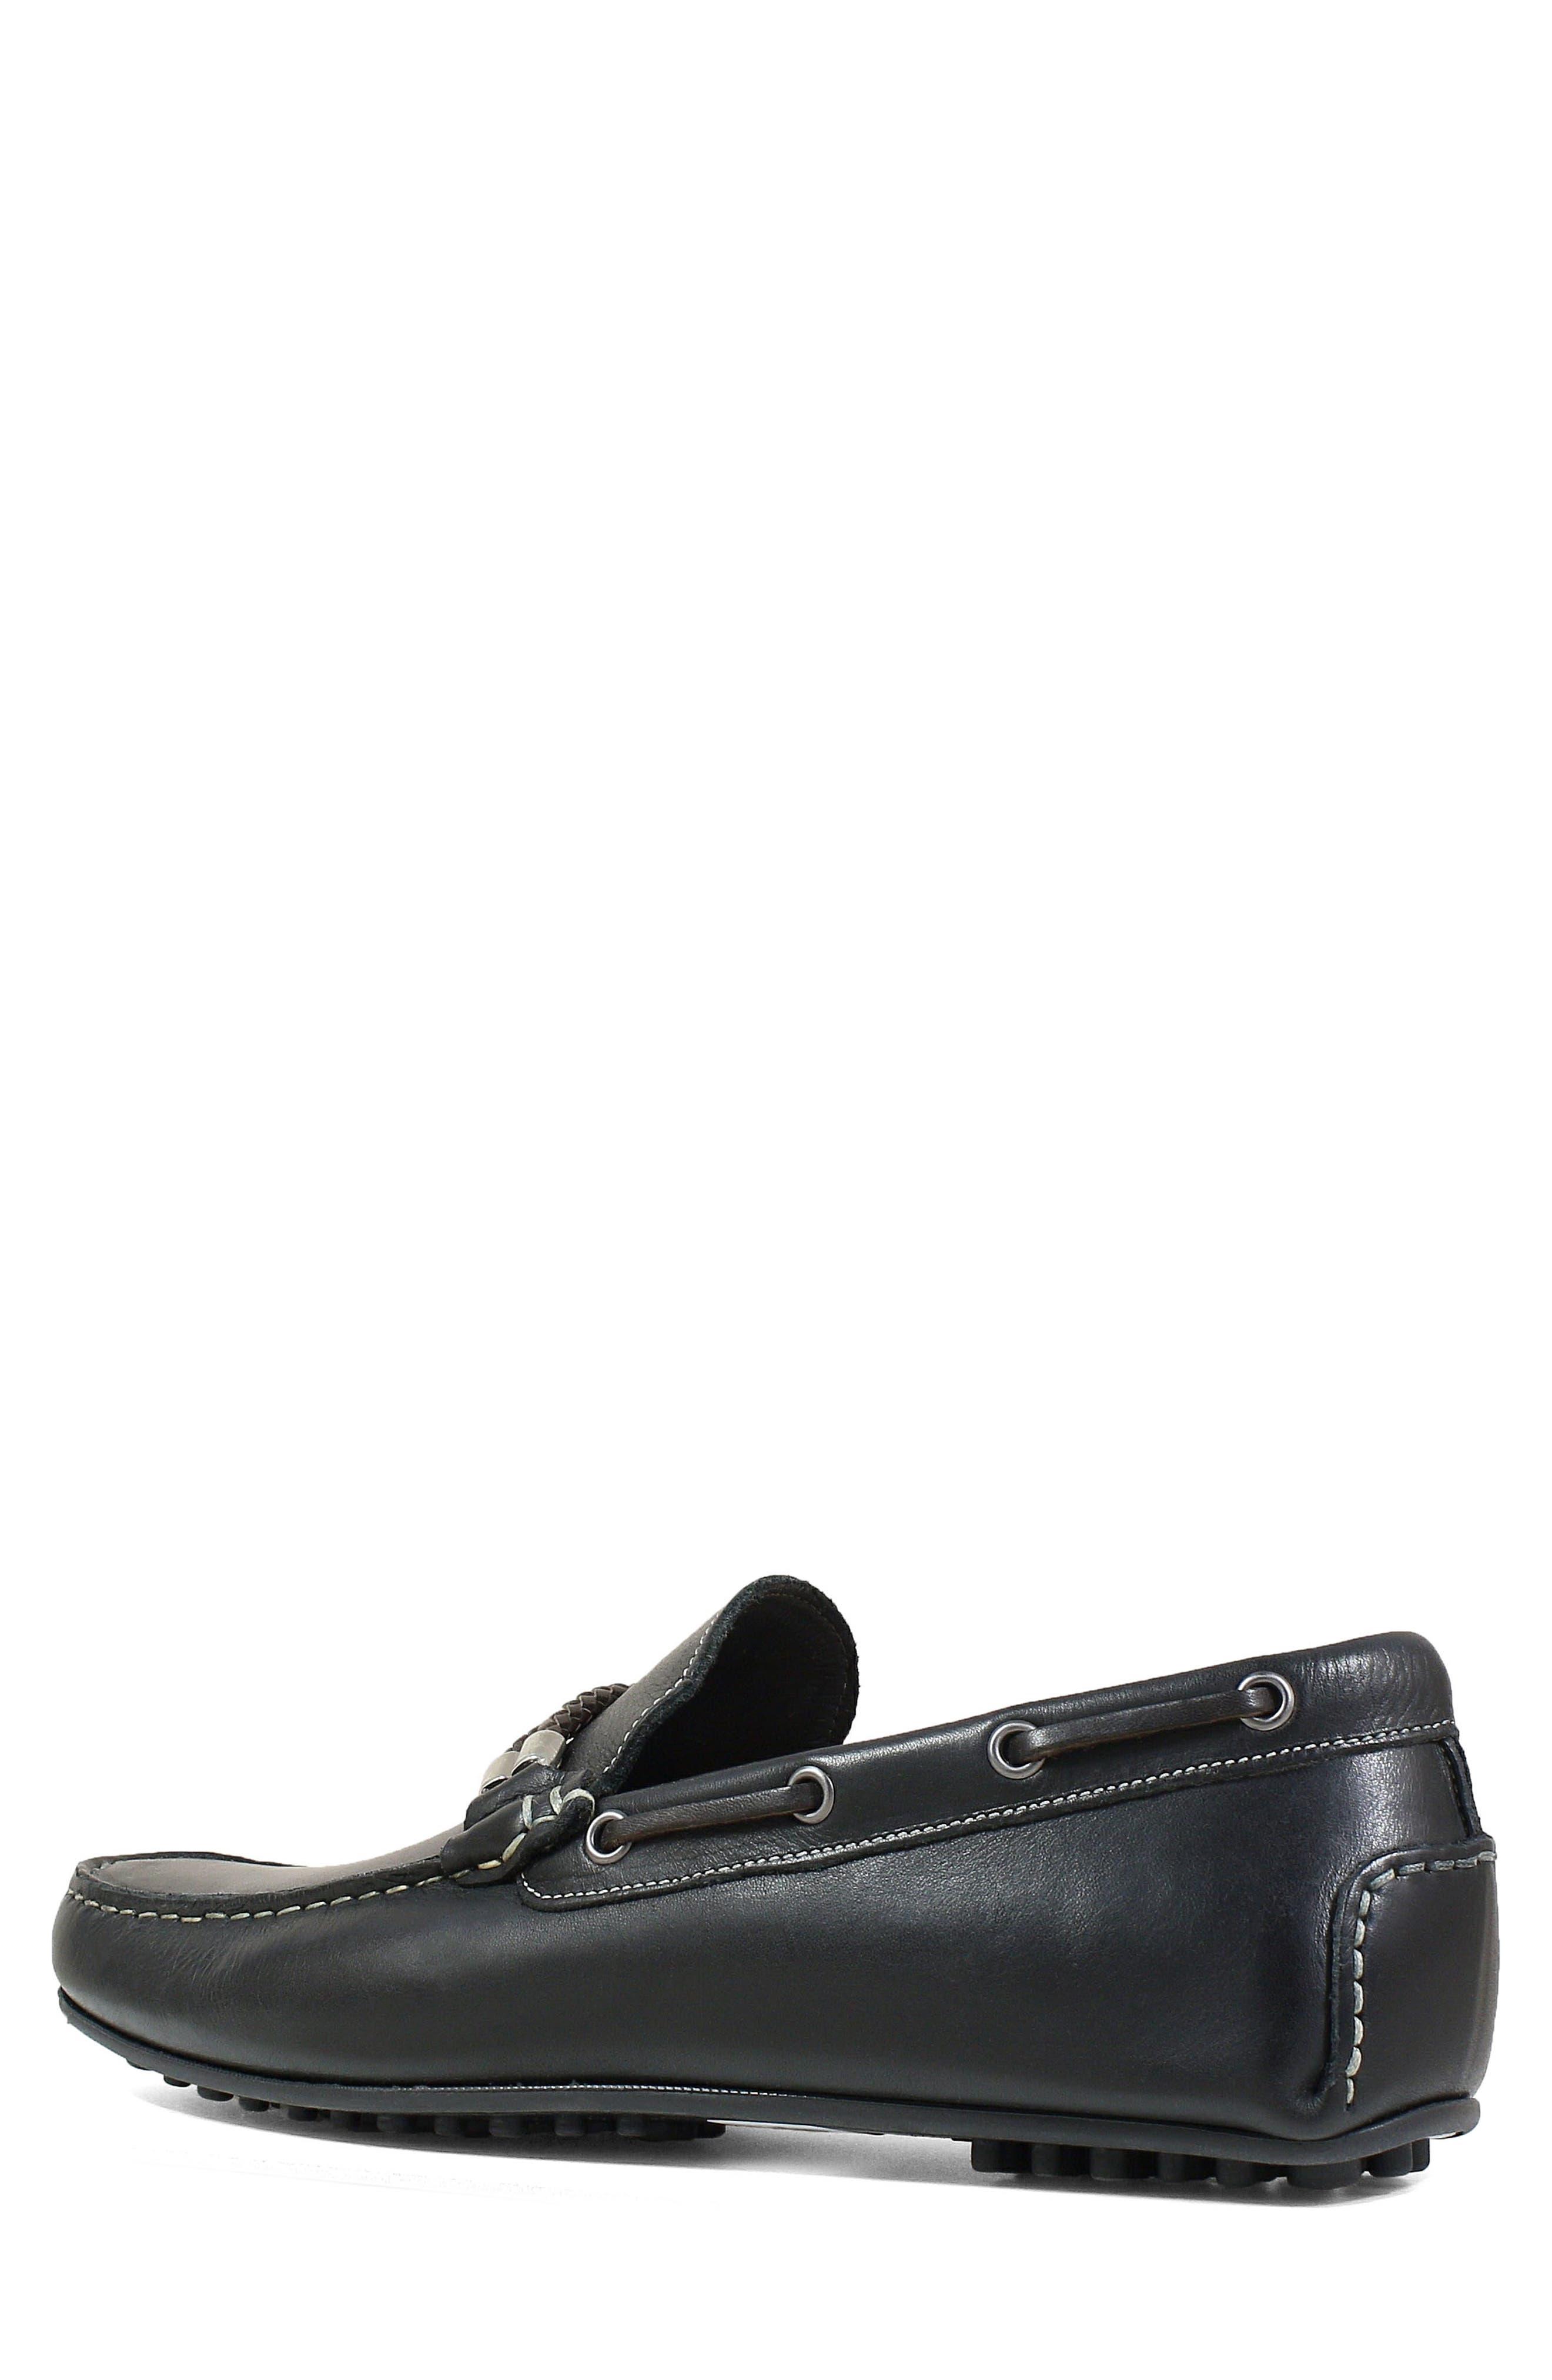 FLORSHEIM,                             Imperial Comet Driving Shoe,                             Alternate thumbnail 2, color,                             BLACK LEATHER